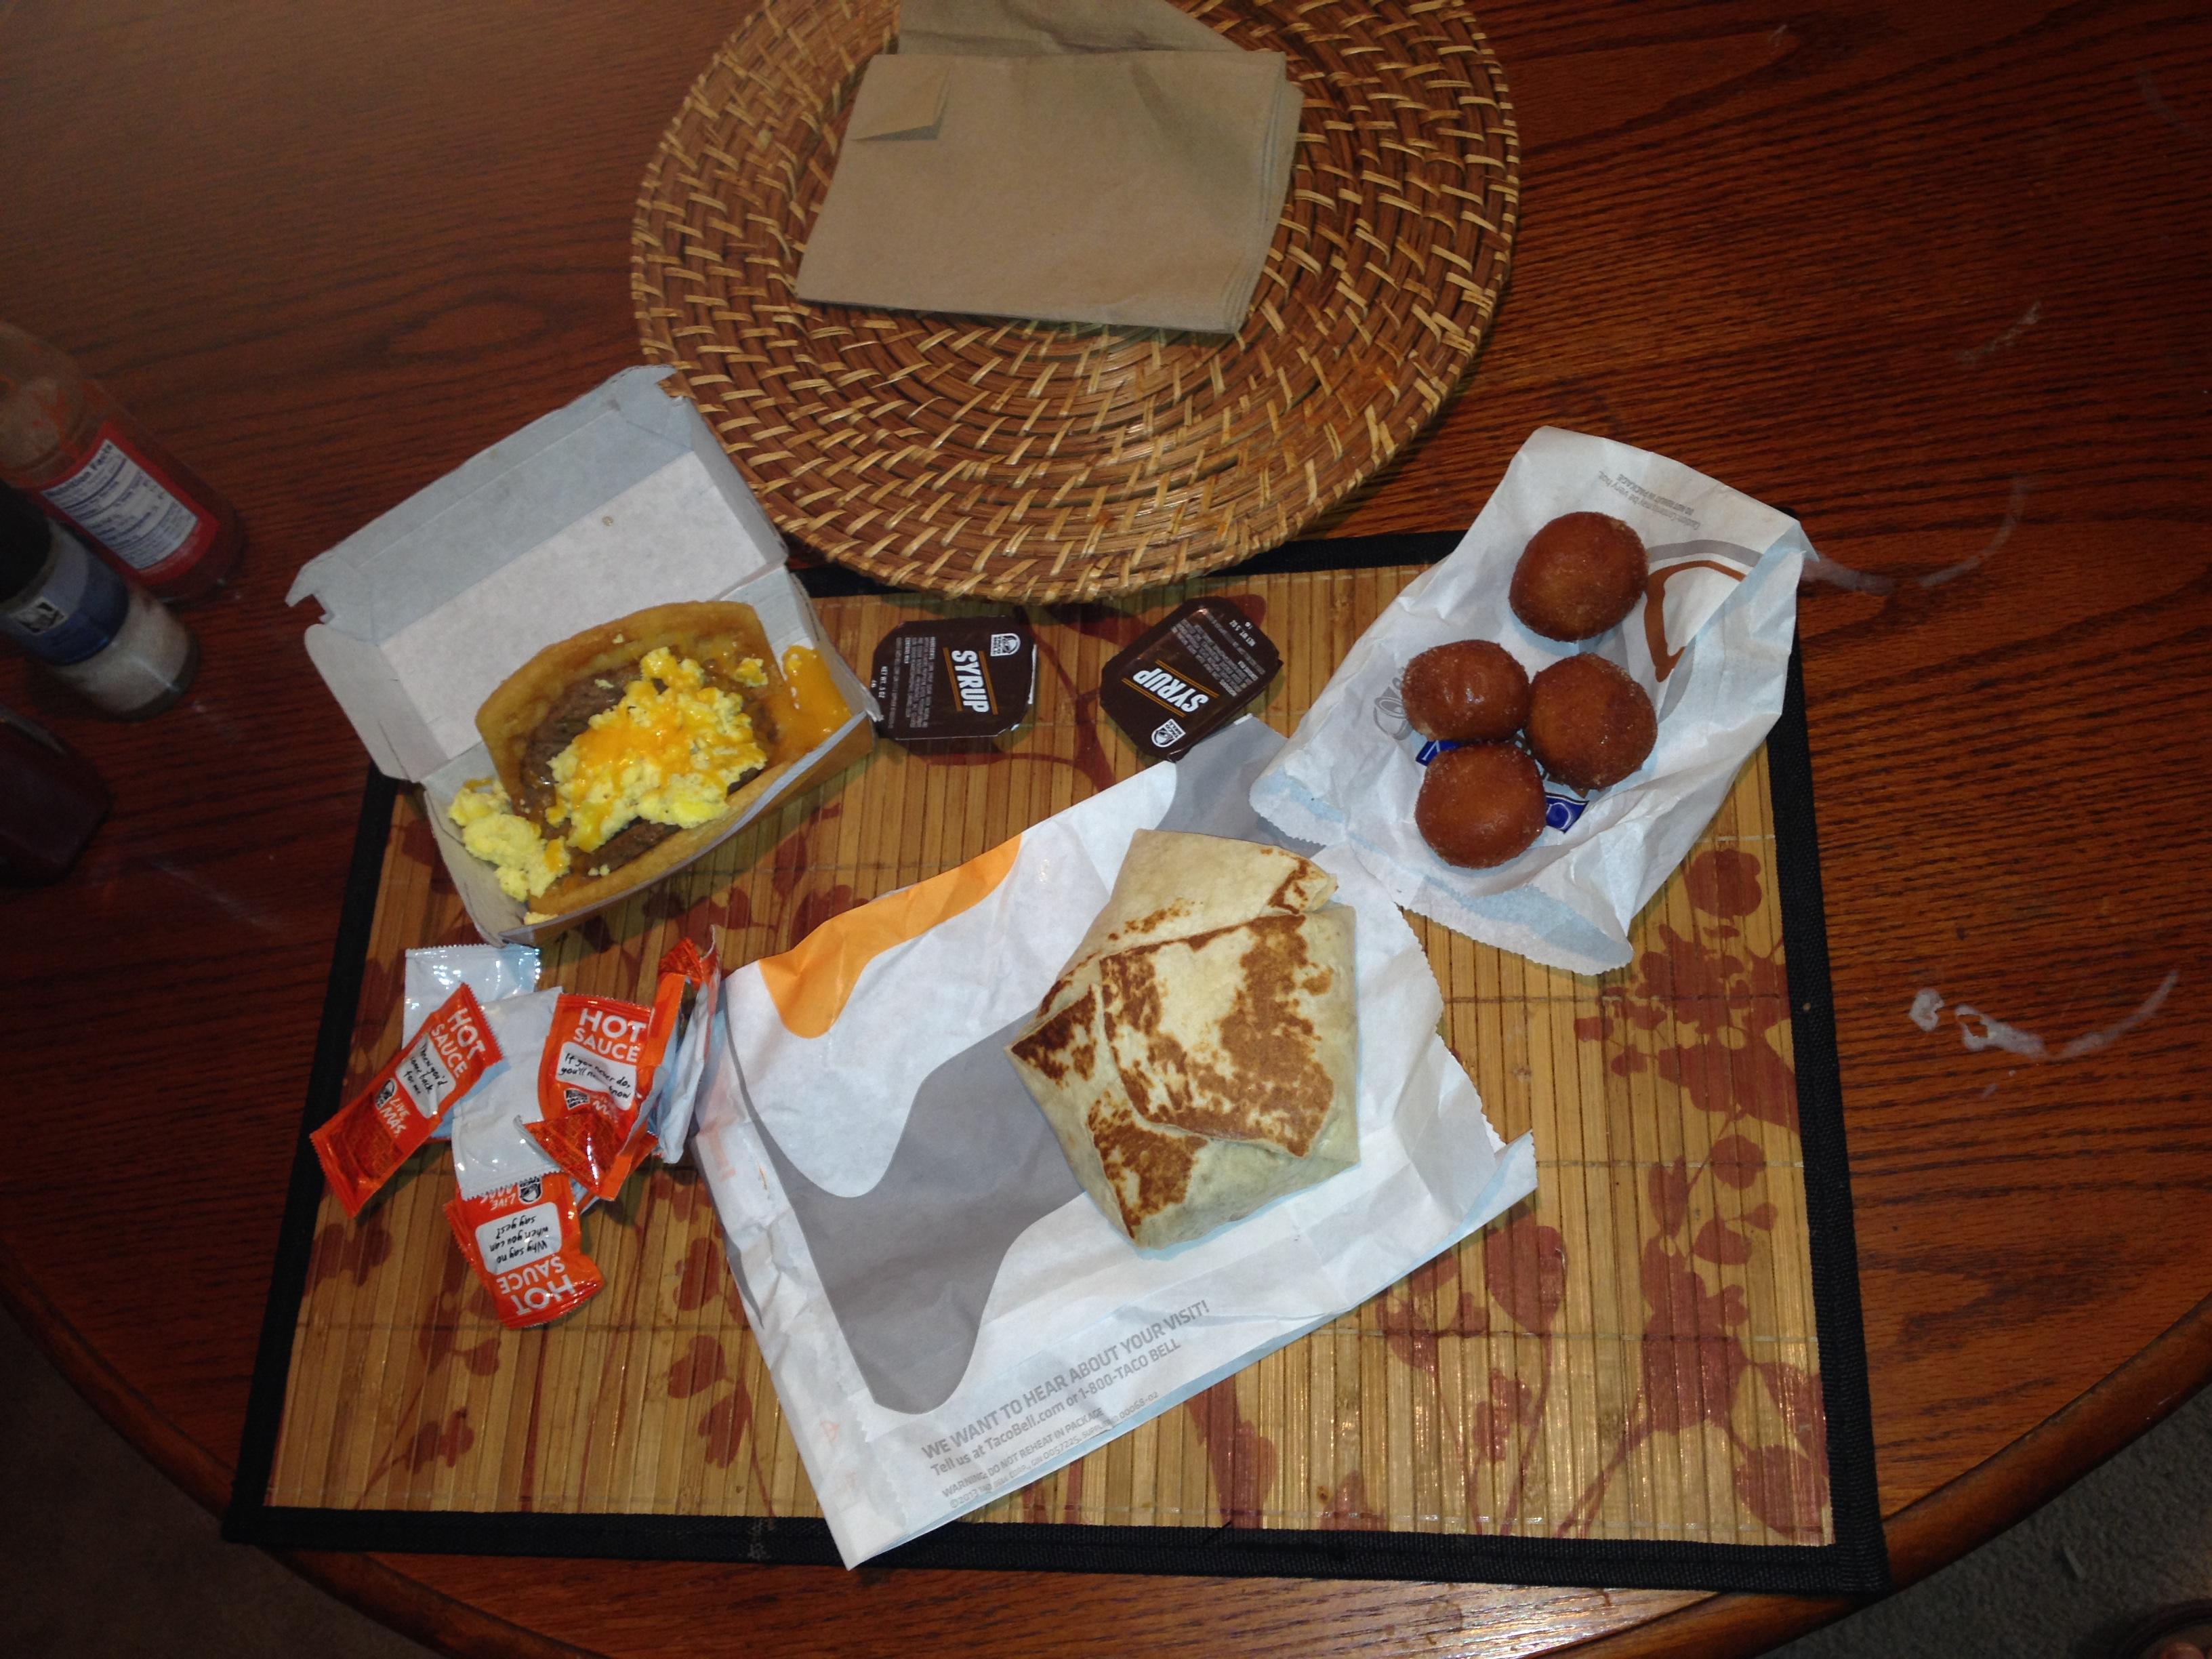 Clockwise from upper left: Waffle taco, Cinnabon Delights, A.M. Crunchwrap.